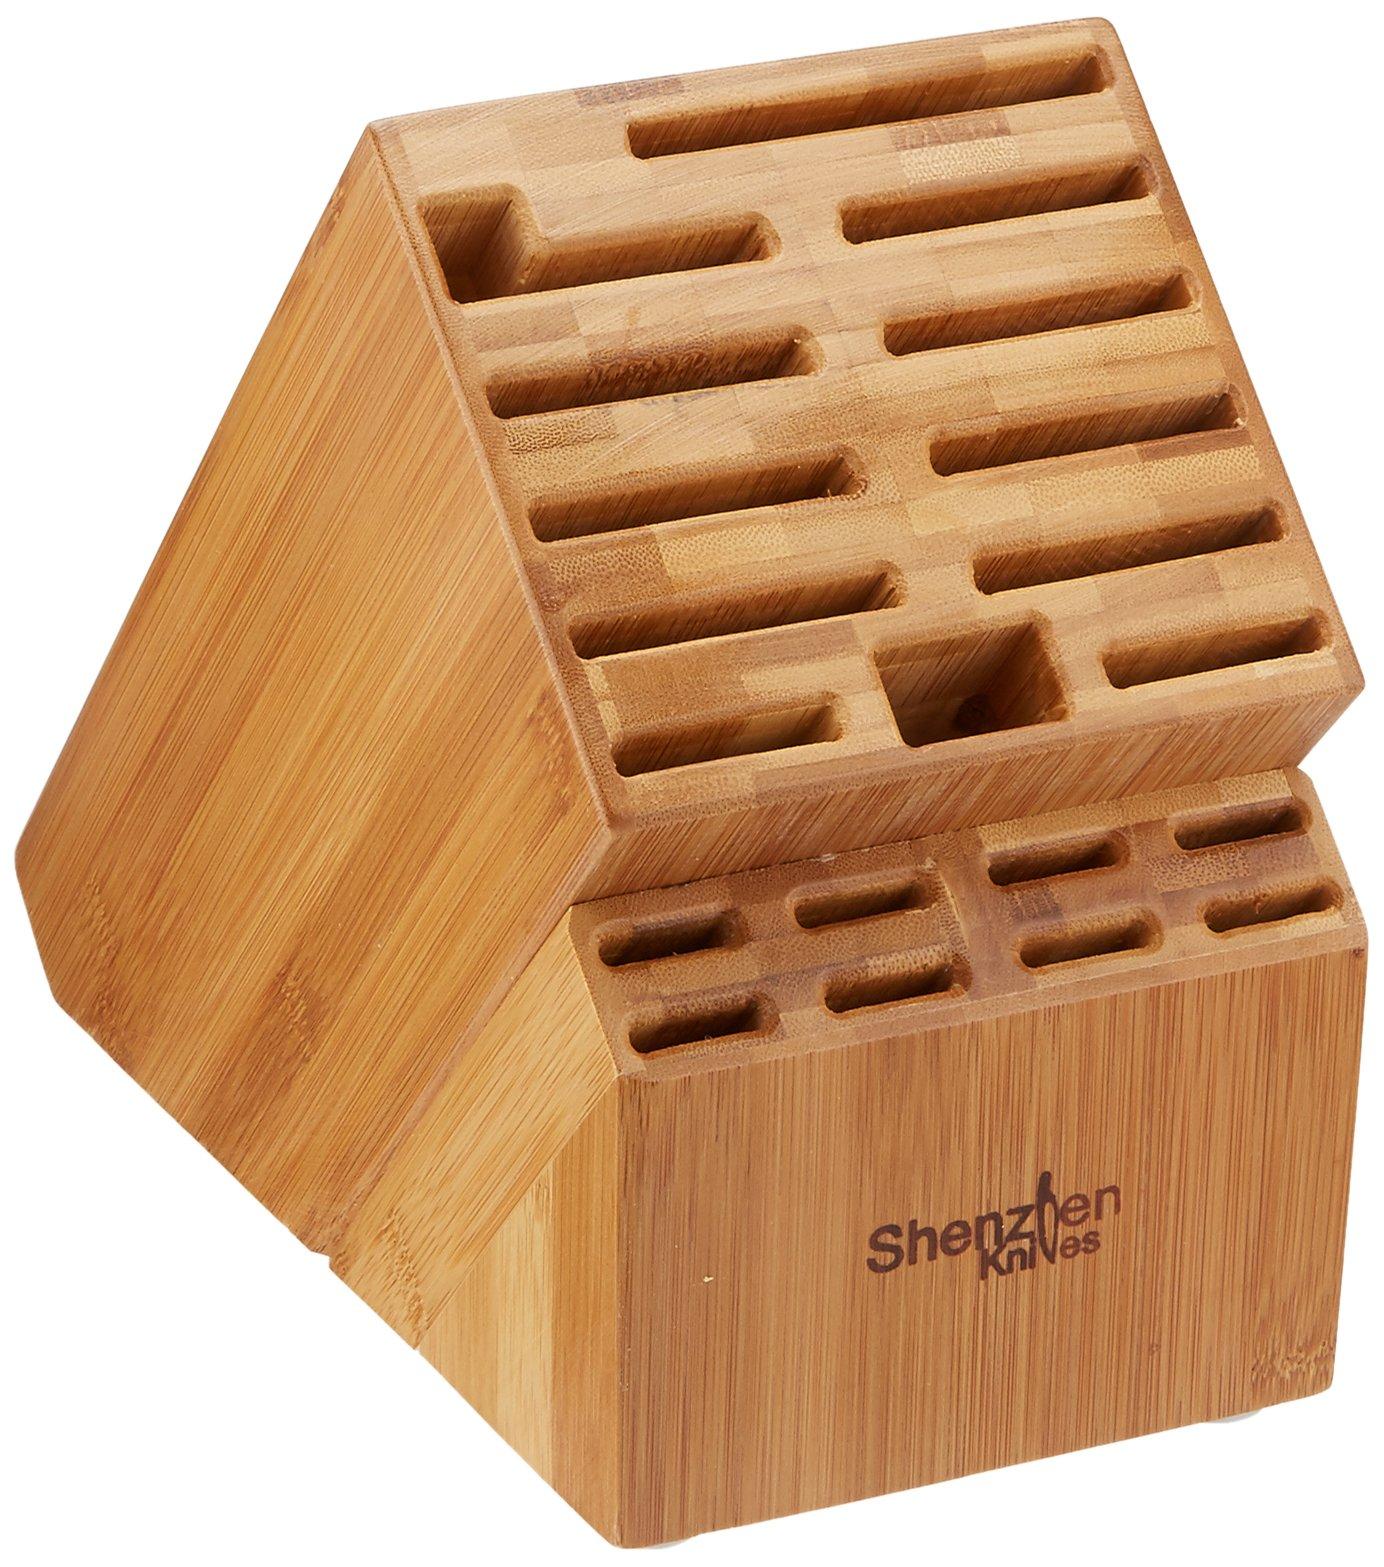 20 slot bamboo universal knife block without knives knife storage organizer ebay. Black Bedroom Furniture Sets. Home Design Ideas